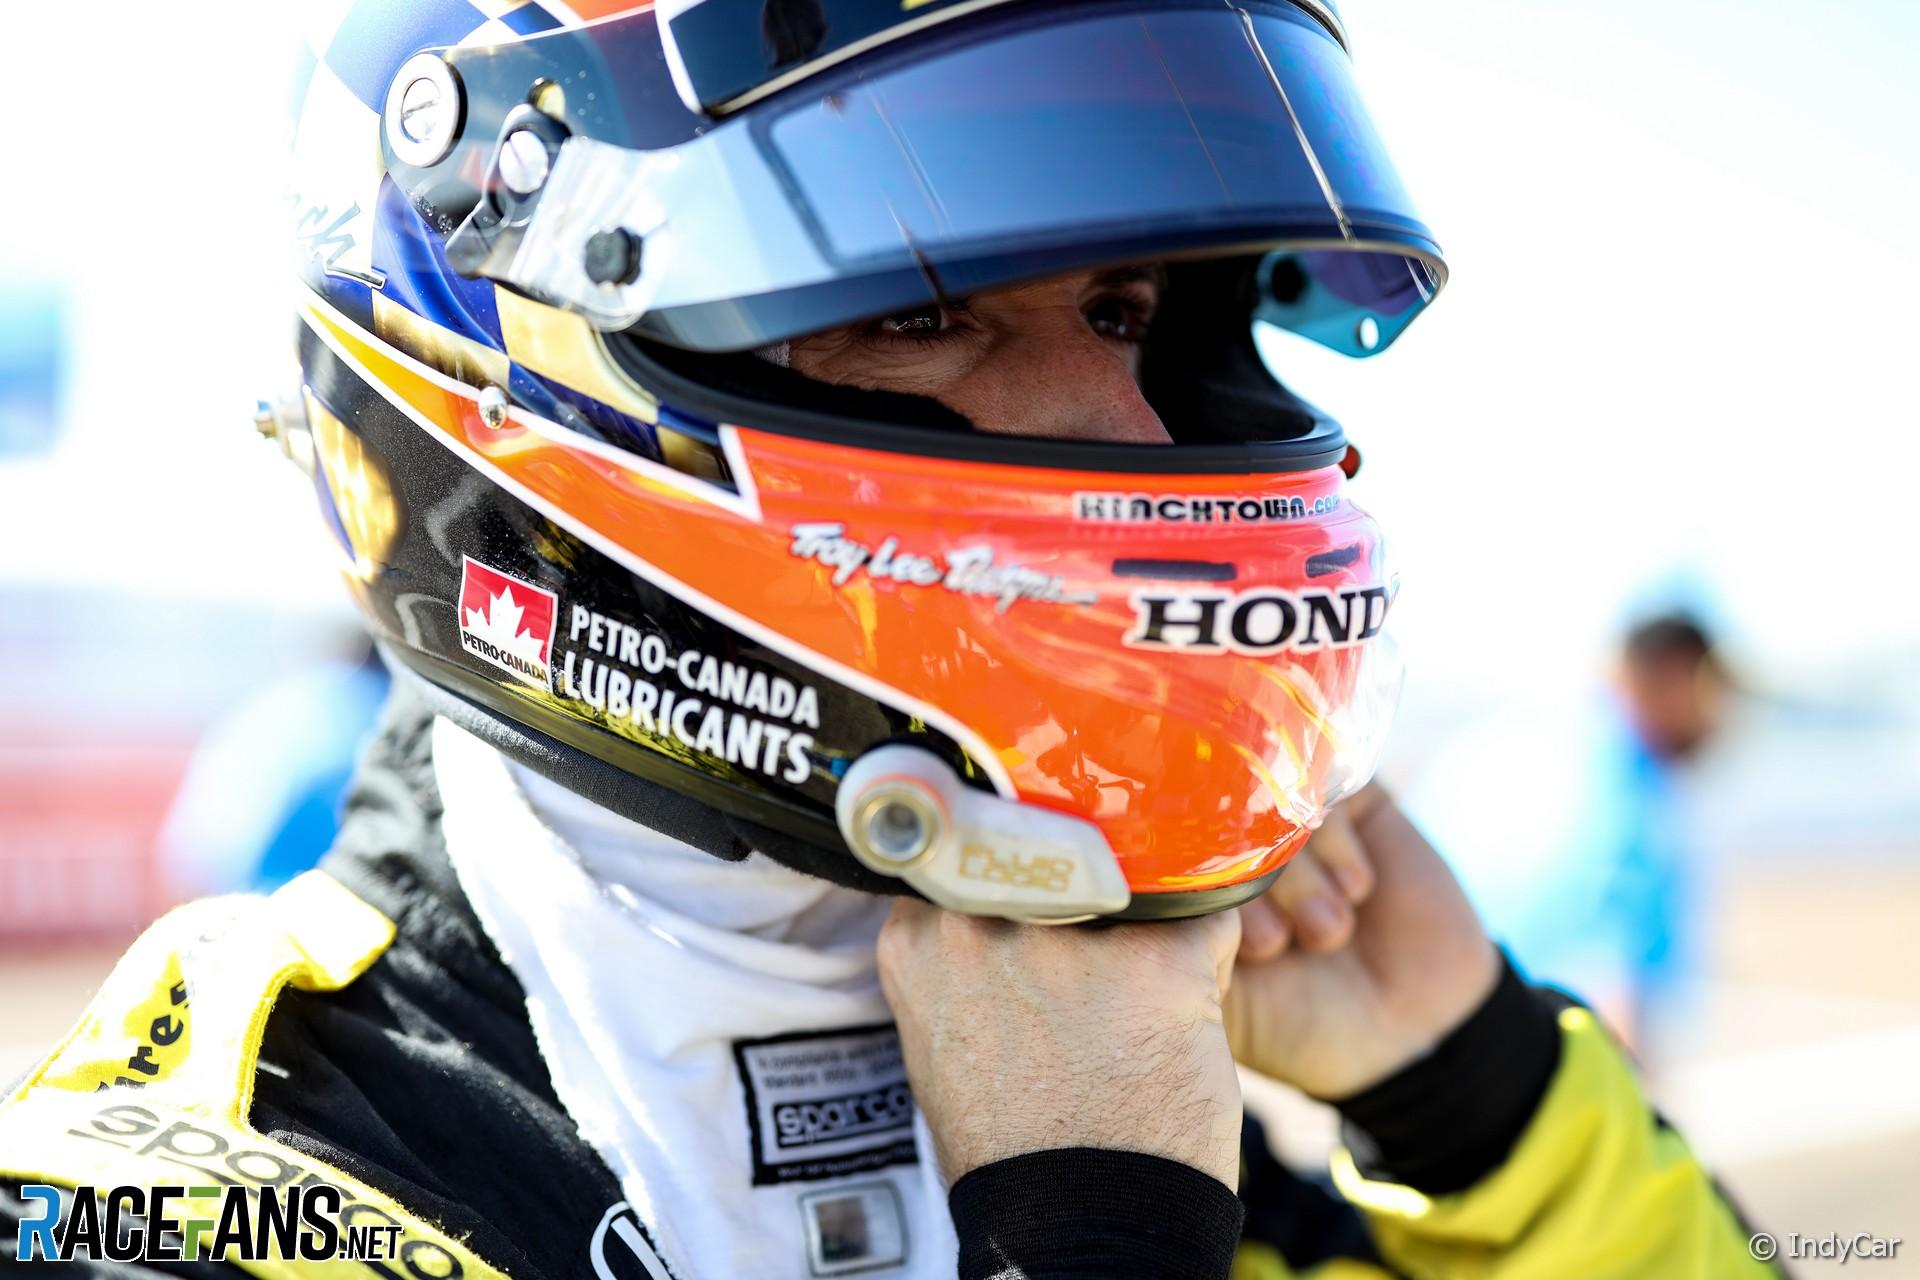 James Hinchcliffe, Andretti, IndyCar, 2020